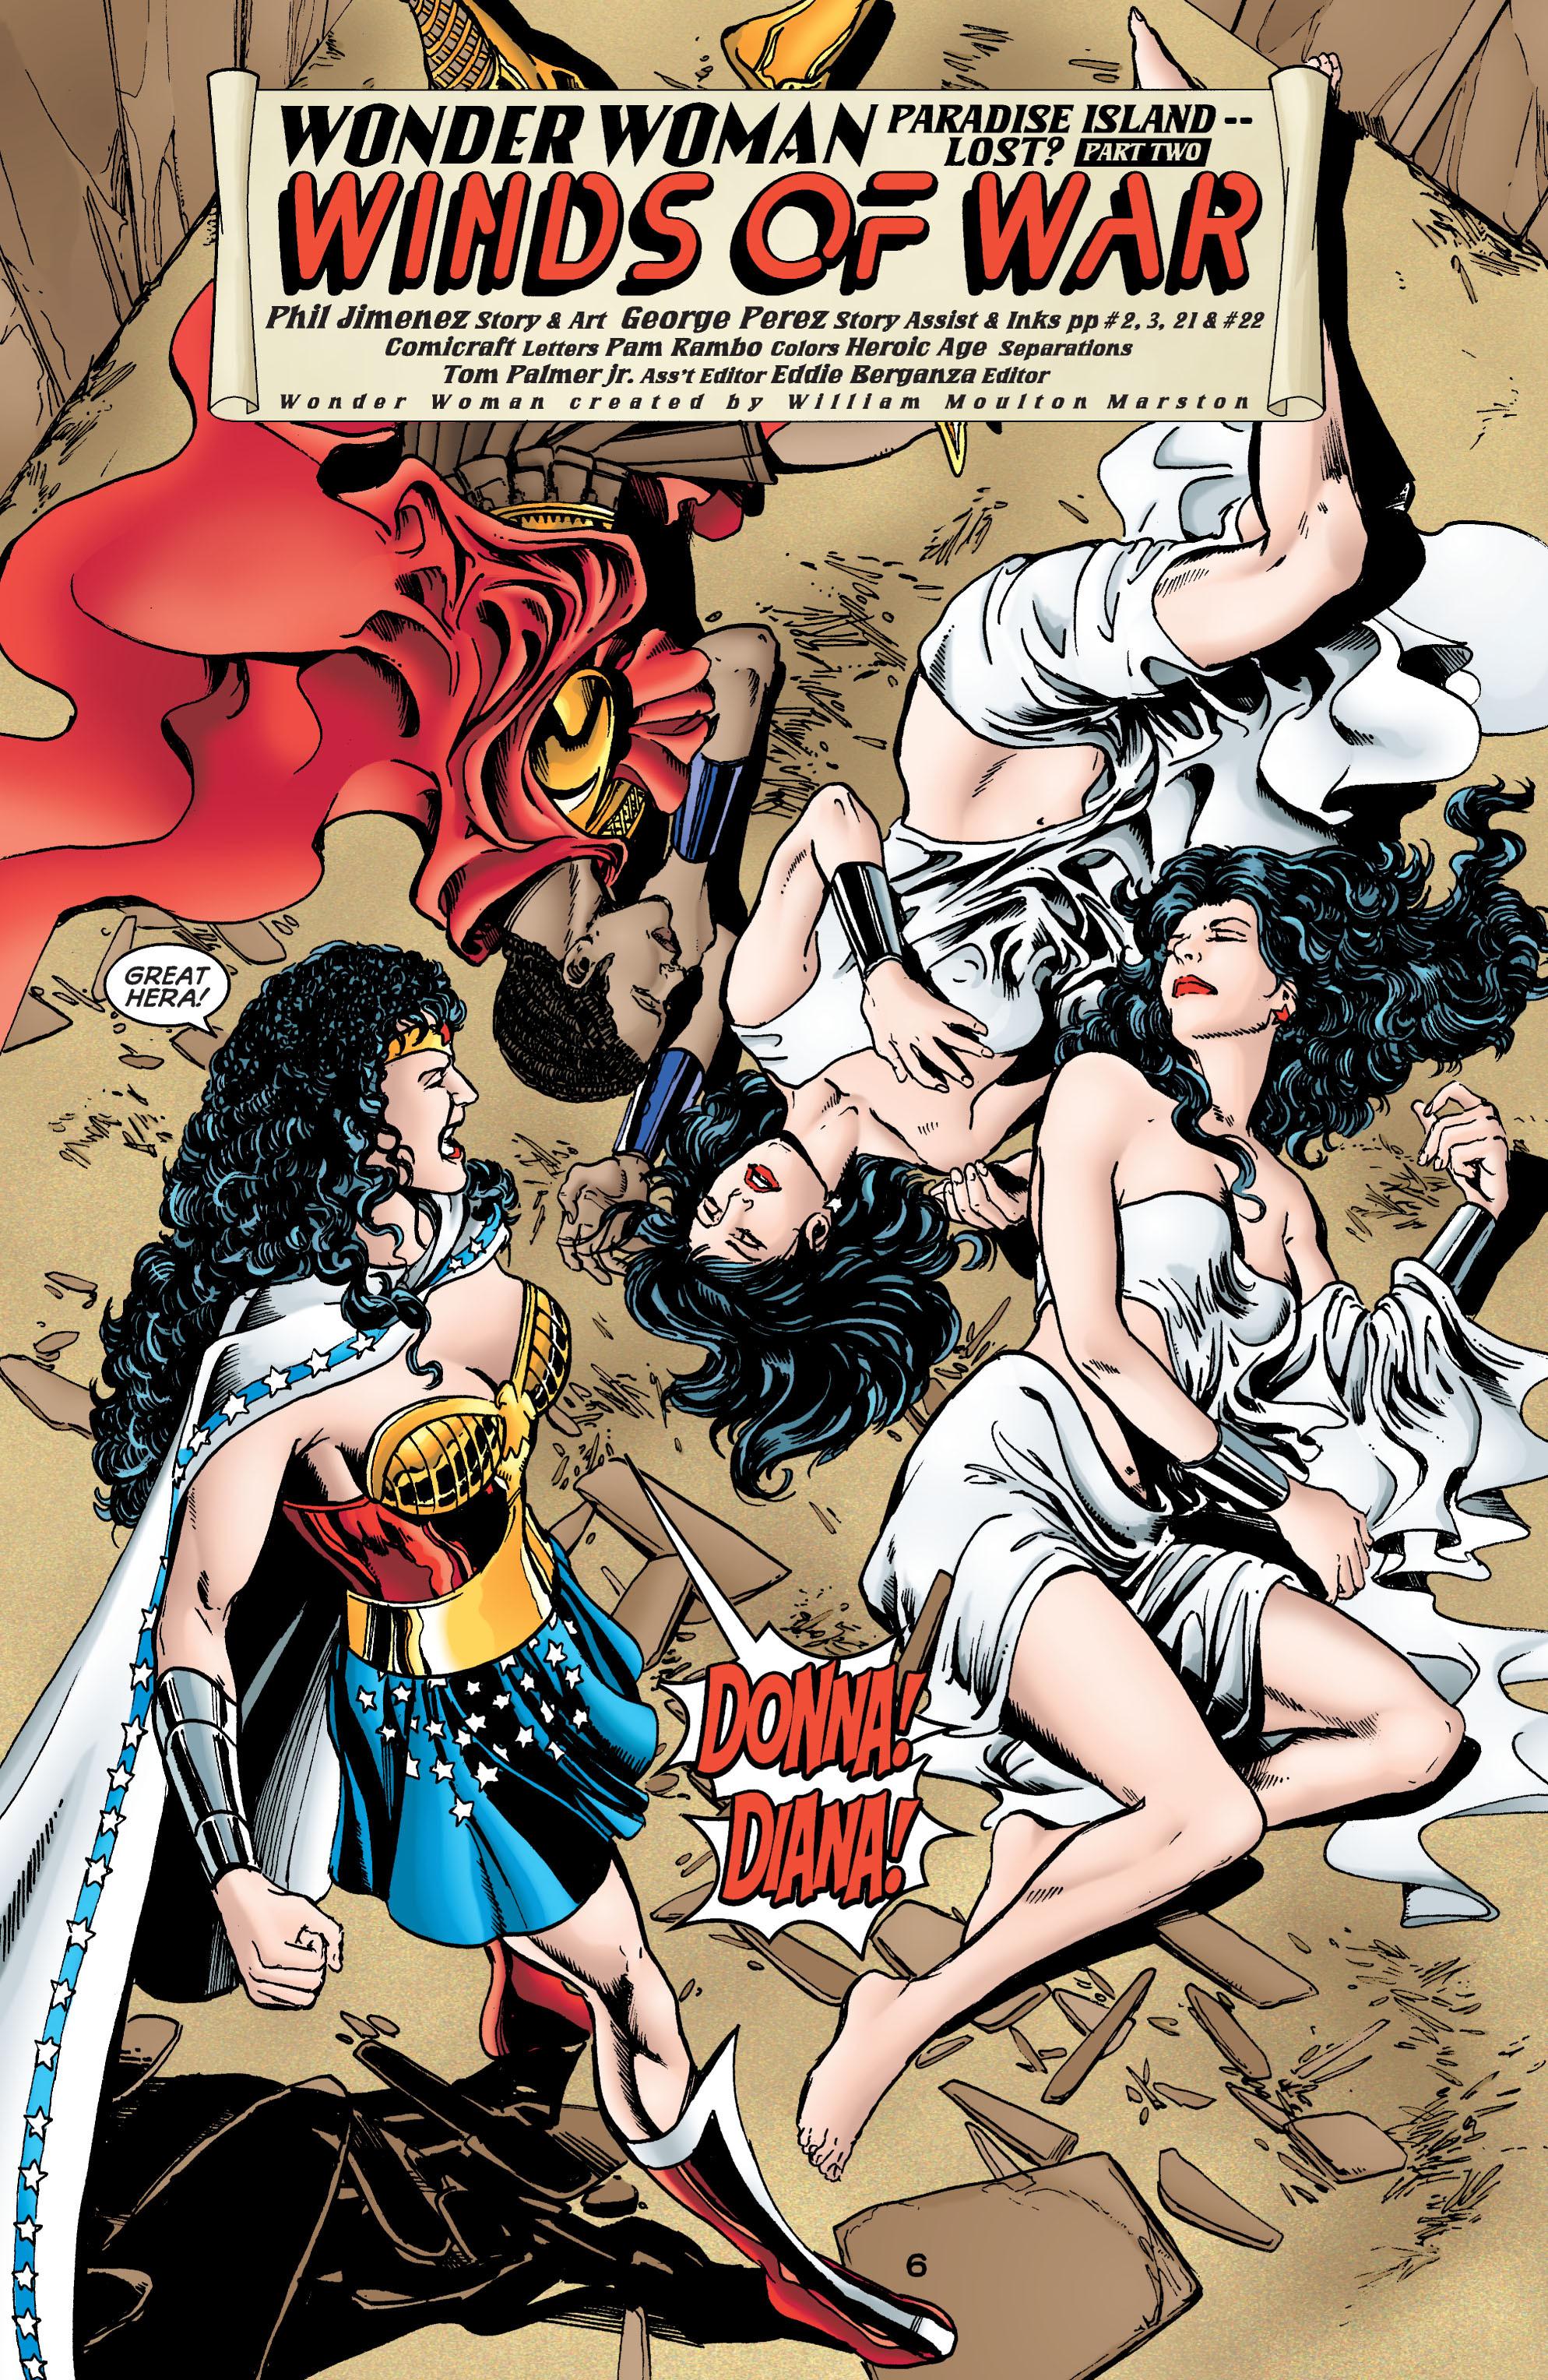 Read online Wonder Woman (1987) comic -  Issue #169 - 7